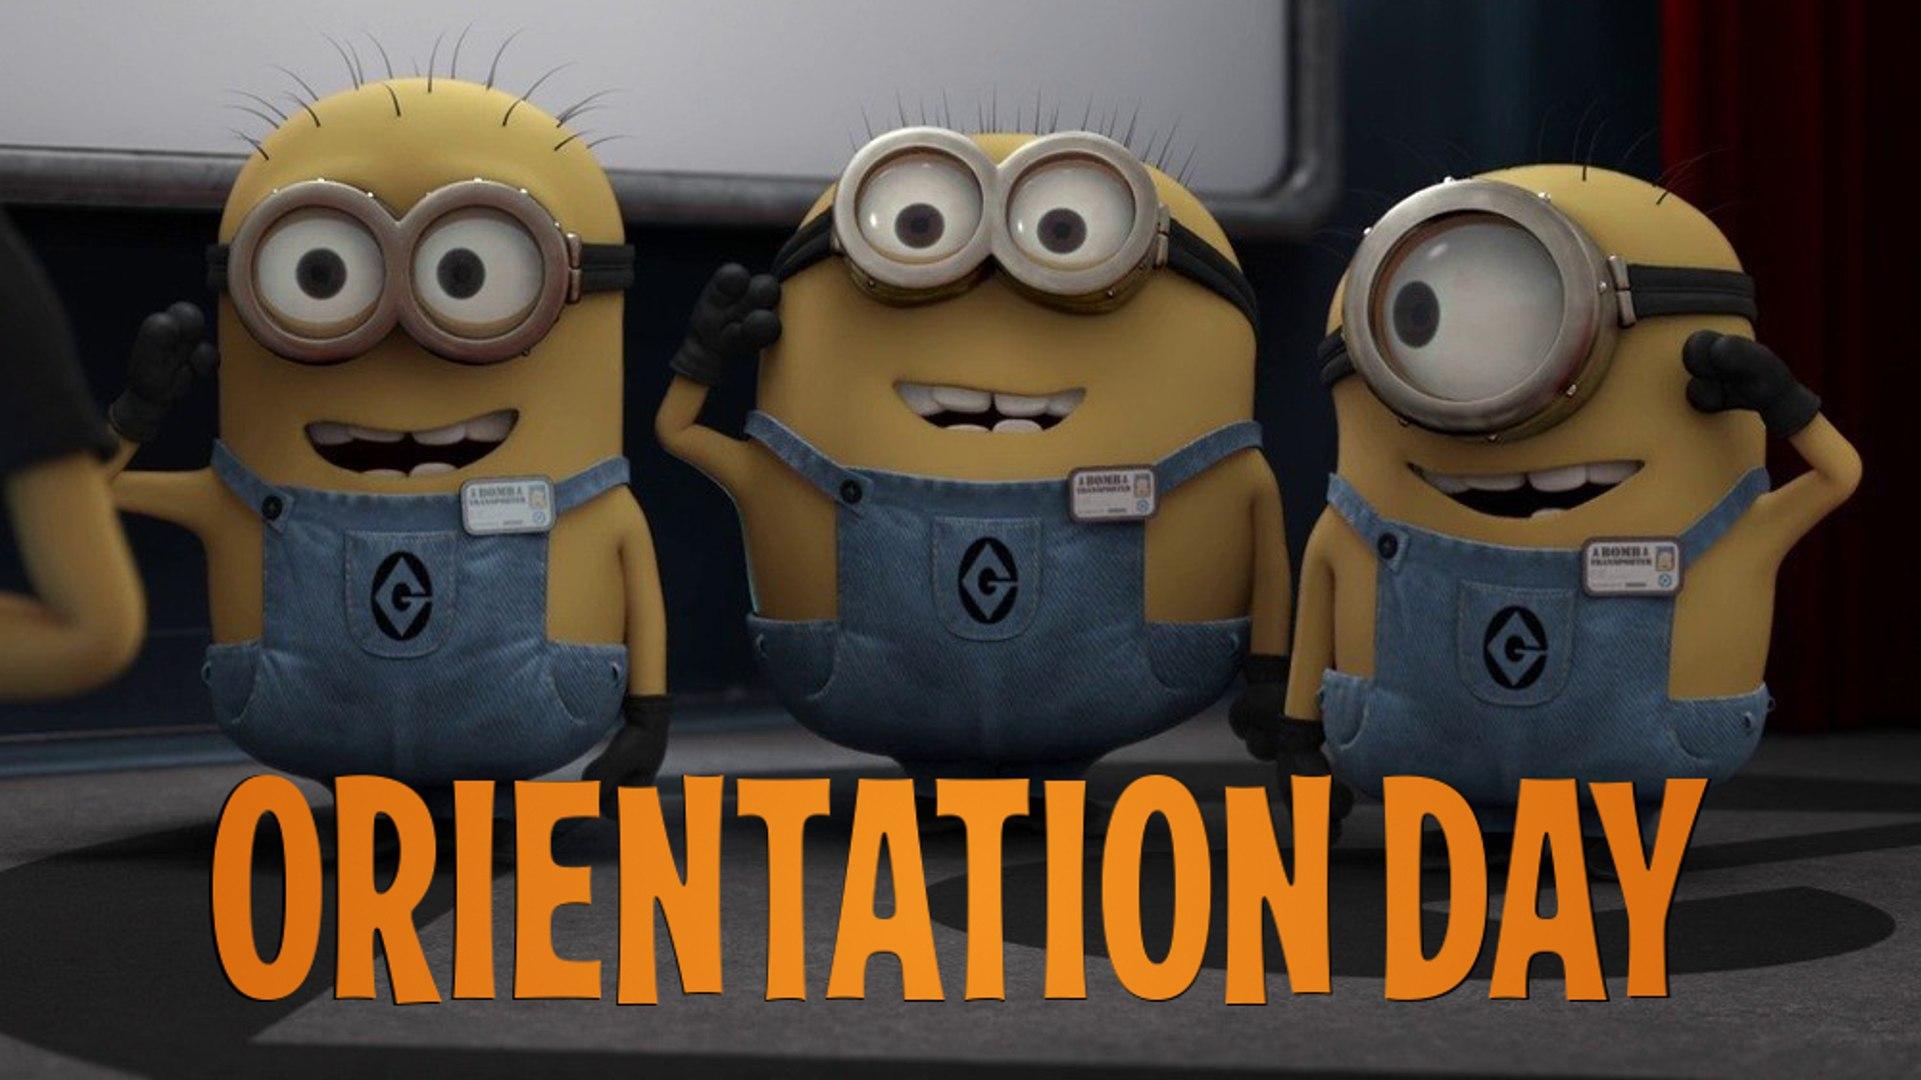 Hasil gambar untuk orientation day minions